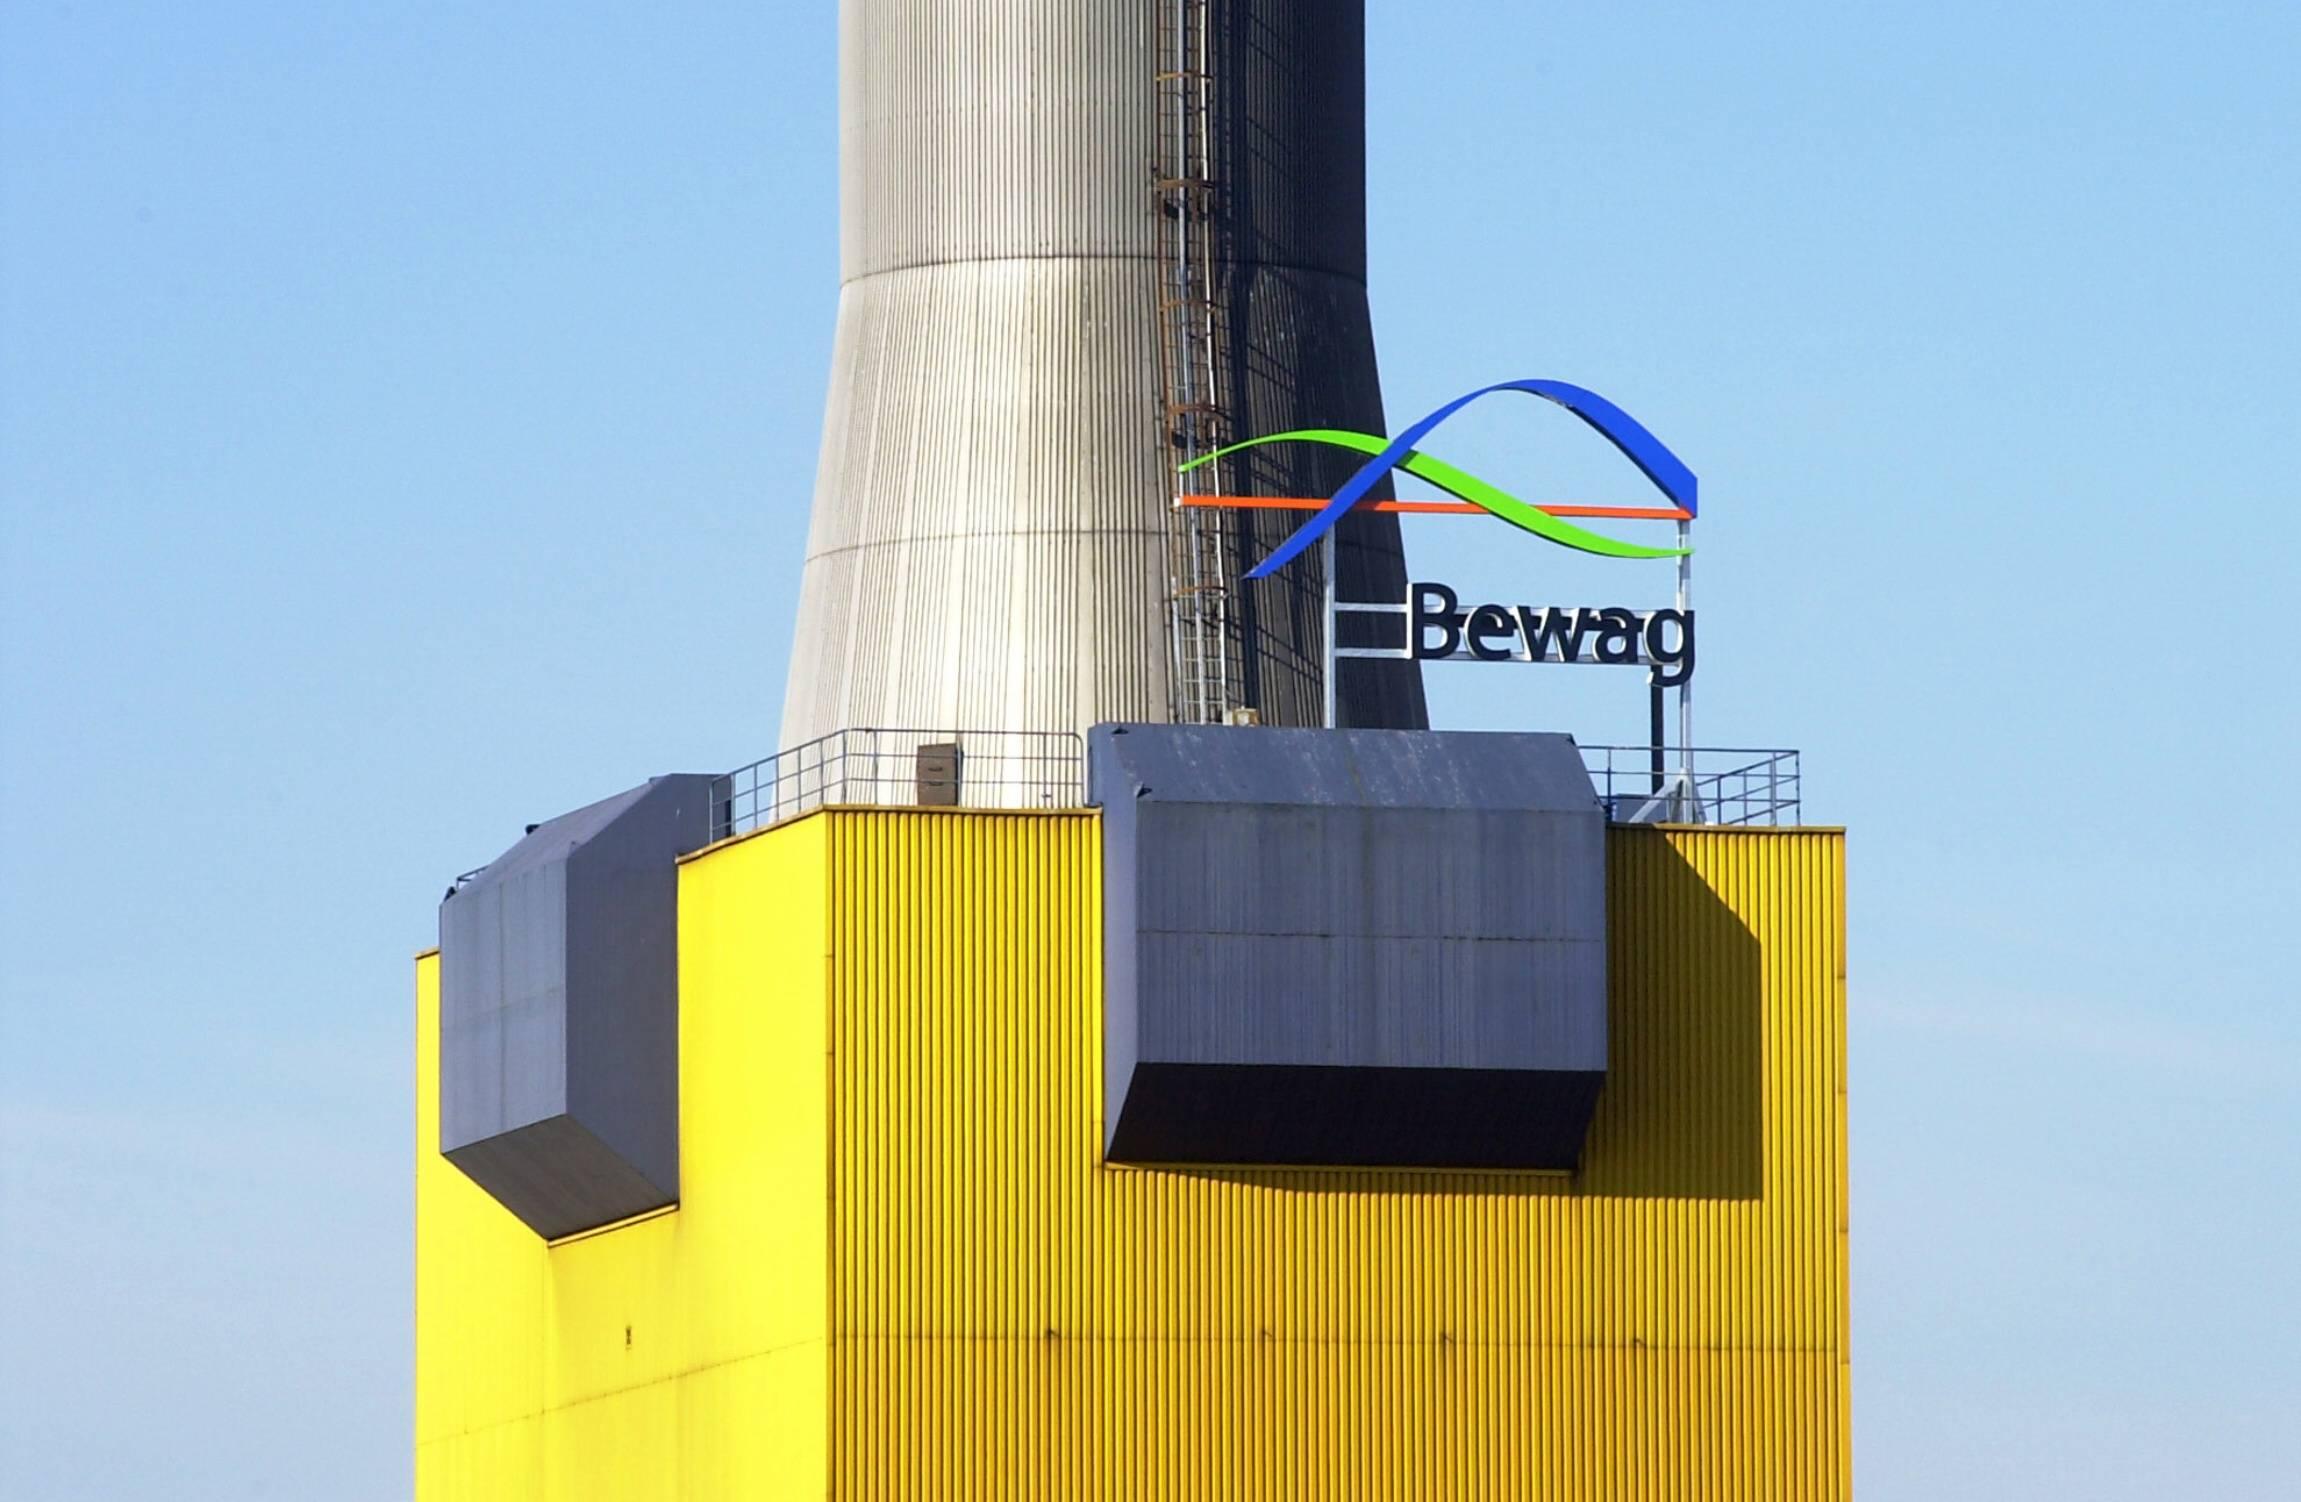 Bewag-Logo am Heizkraftwerk Wilmersdorf, 2002. Foto: Imago/Christian Ditsch